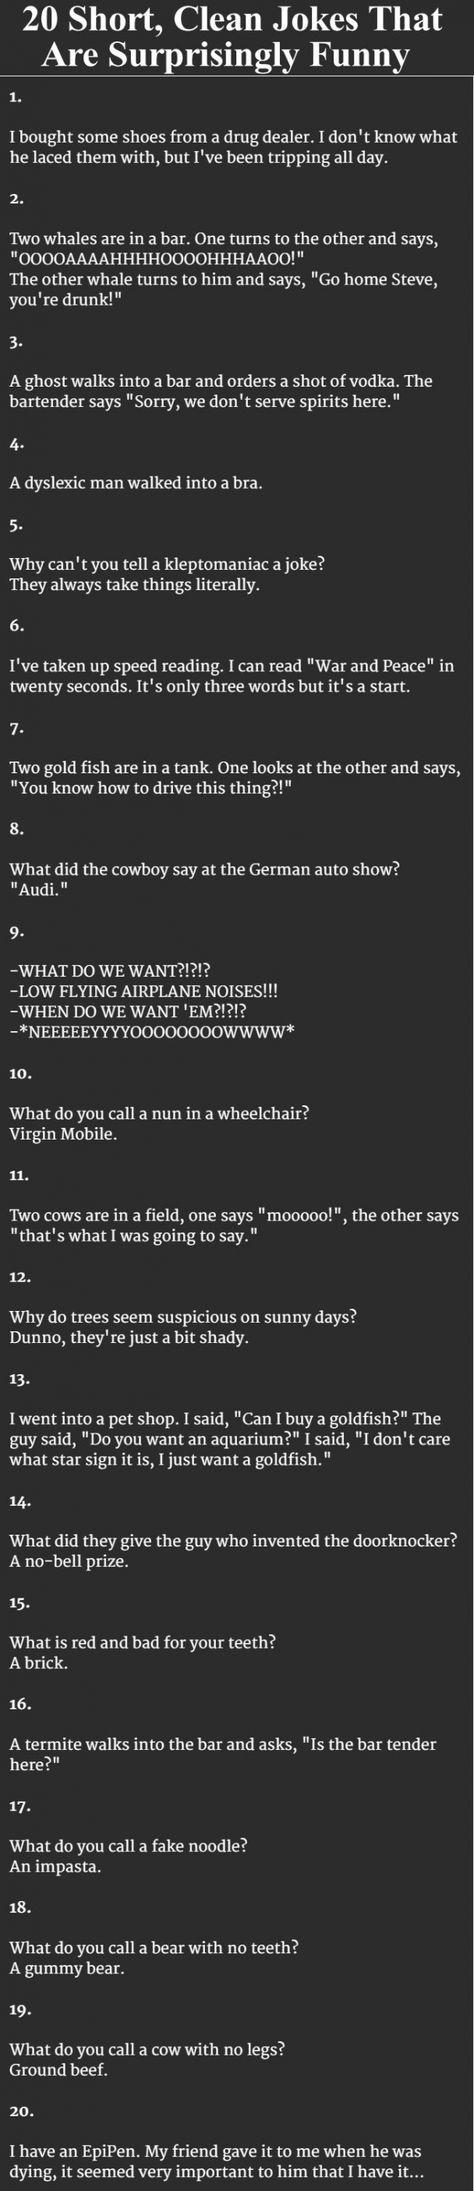 Surprisingly funny short clean jokes #sillyjokes #silly #jokes #funny